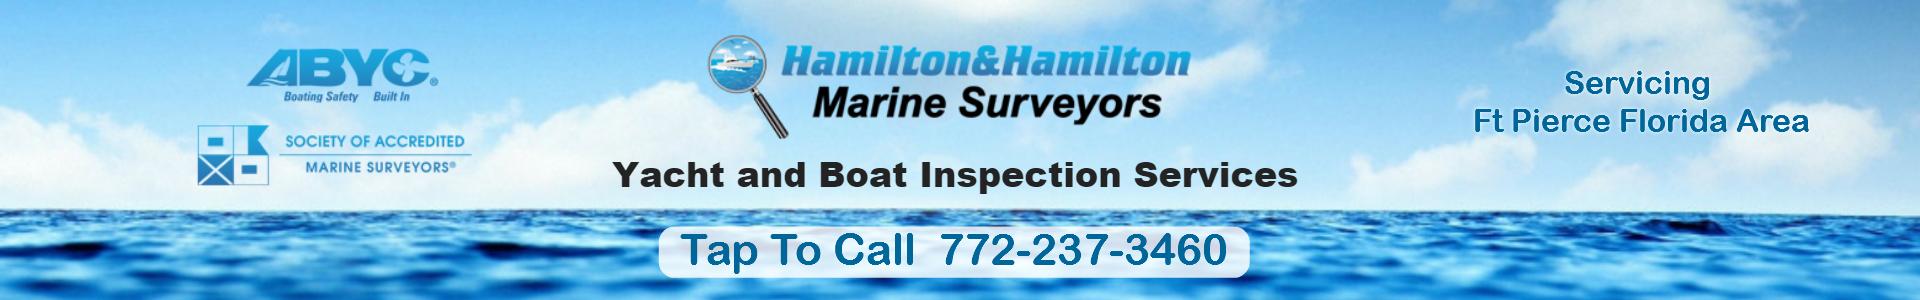 Marine Surveyor Ft Pierce FL Boat Inspection SAMS Surveyors Ft Pierce